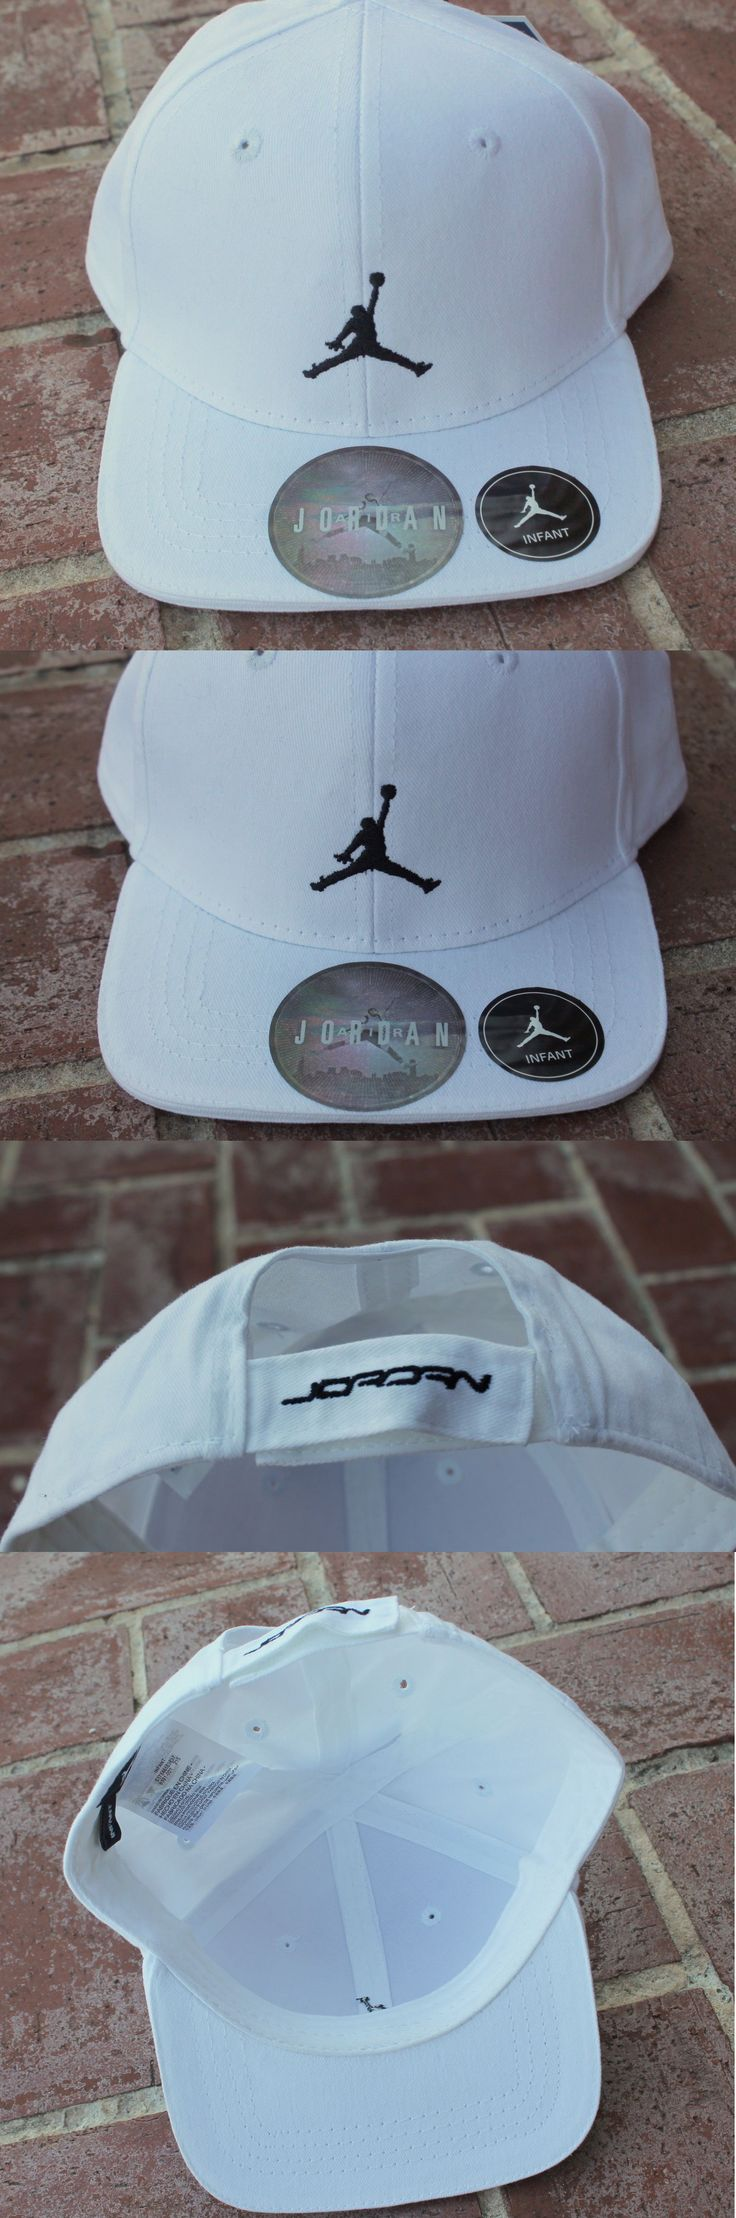 Michael Jordan Baby Clothing: New Nike Air Michael Jordan Infant Baby Boy Girl White Baseball Cap 12-18-24 M BUY IT NOW ONLY: $16.95